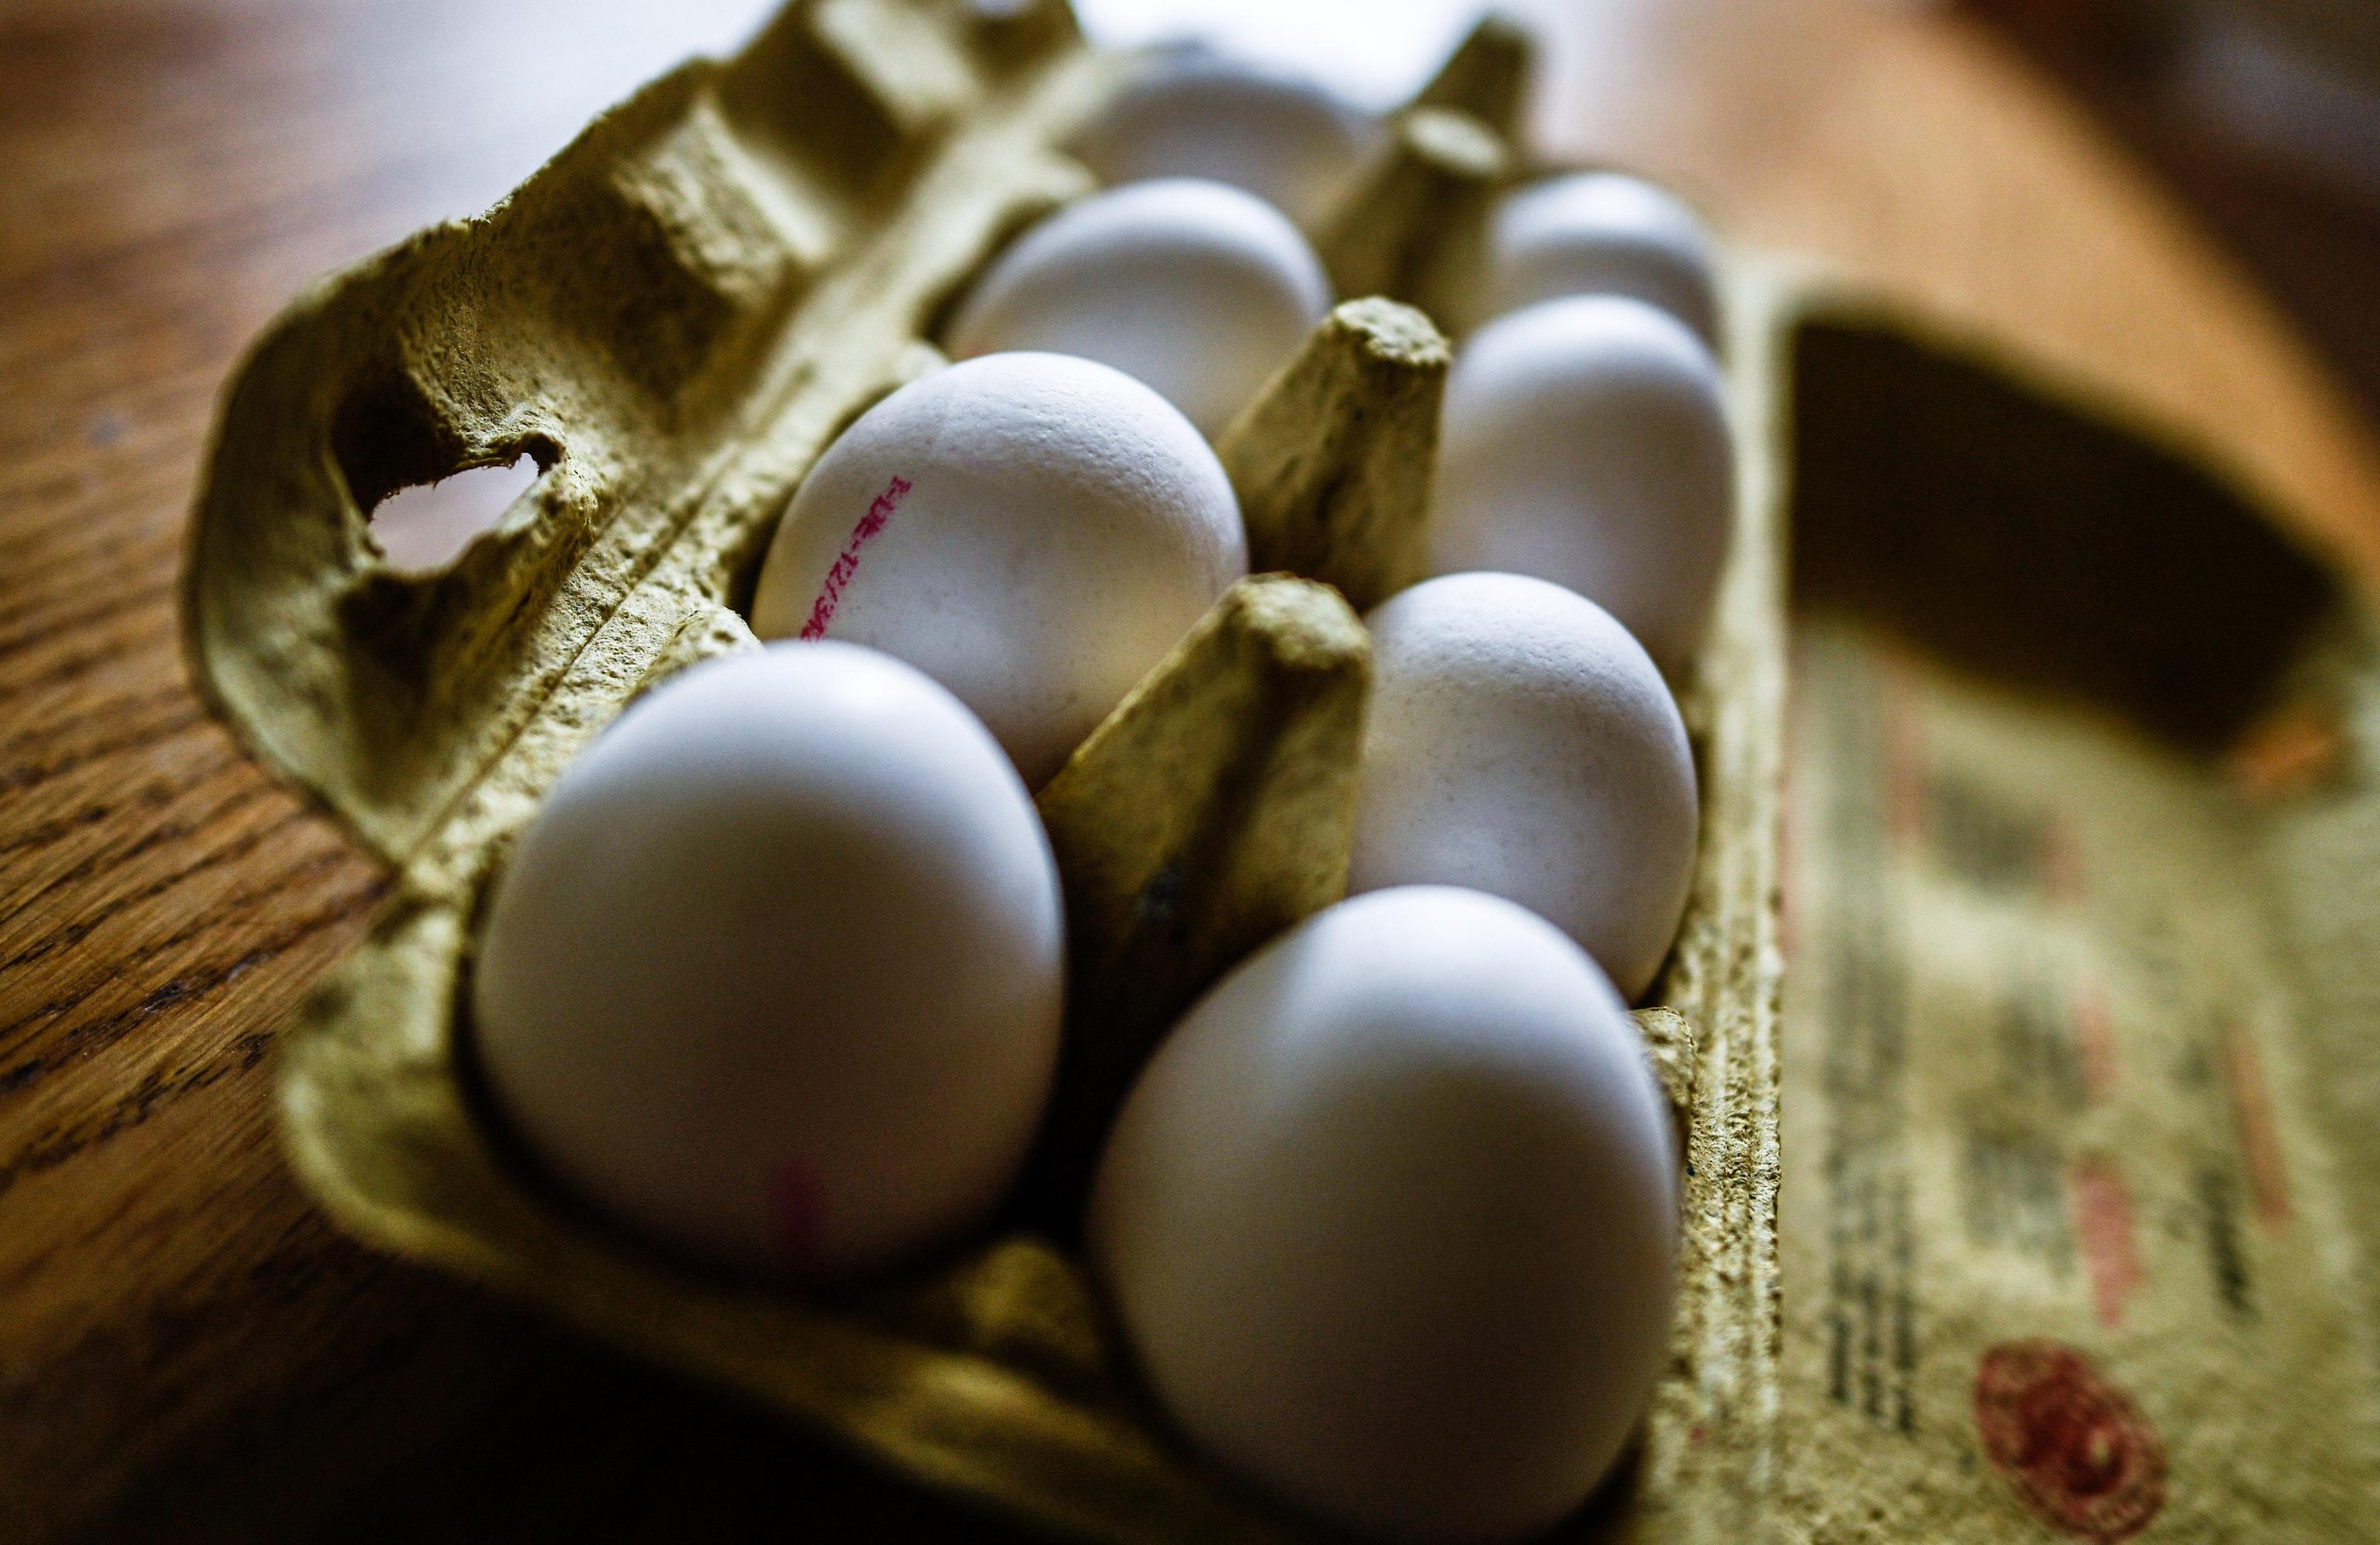 Fipronil nelle uova: sintomi e i rischi per la salute umana